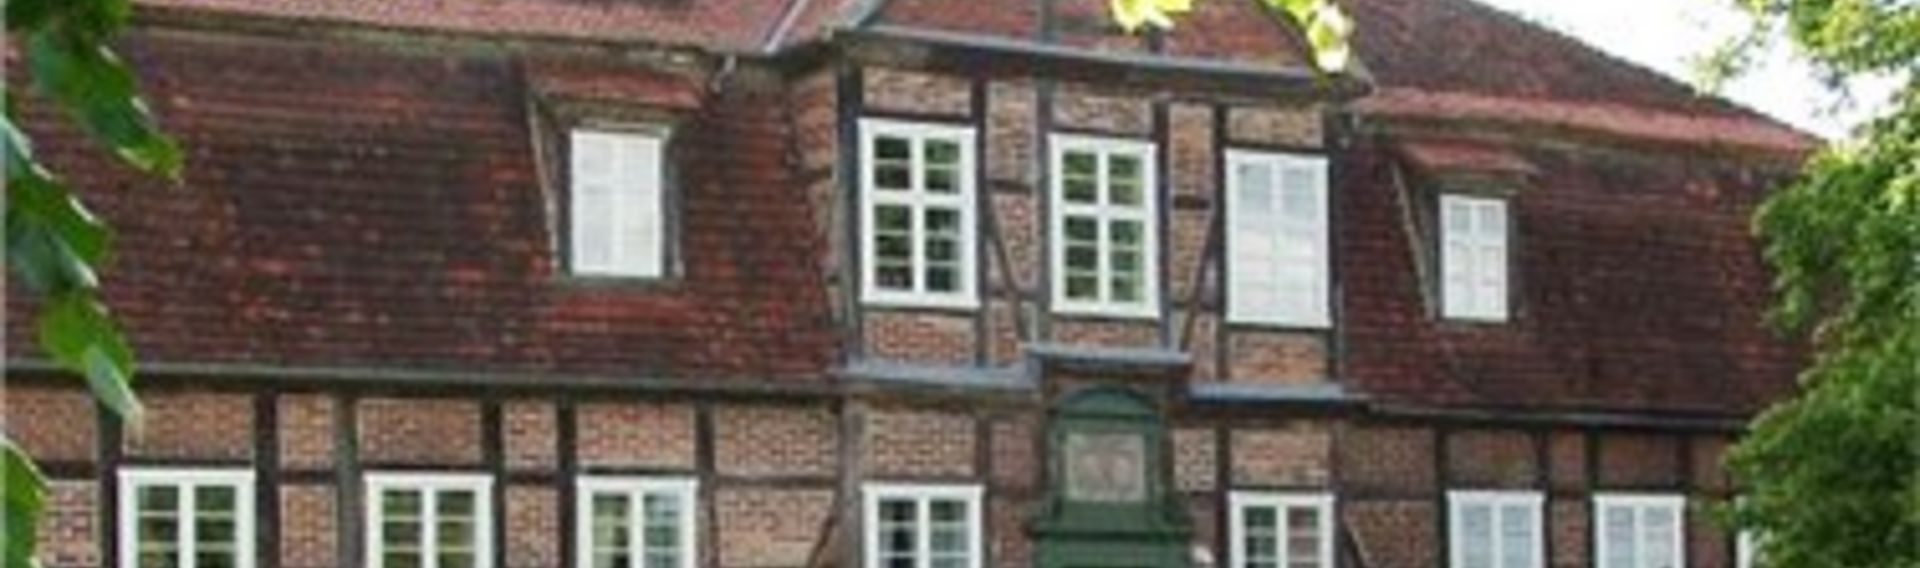 Jagdschule & Pension Schwiessel Gutshaus